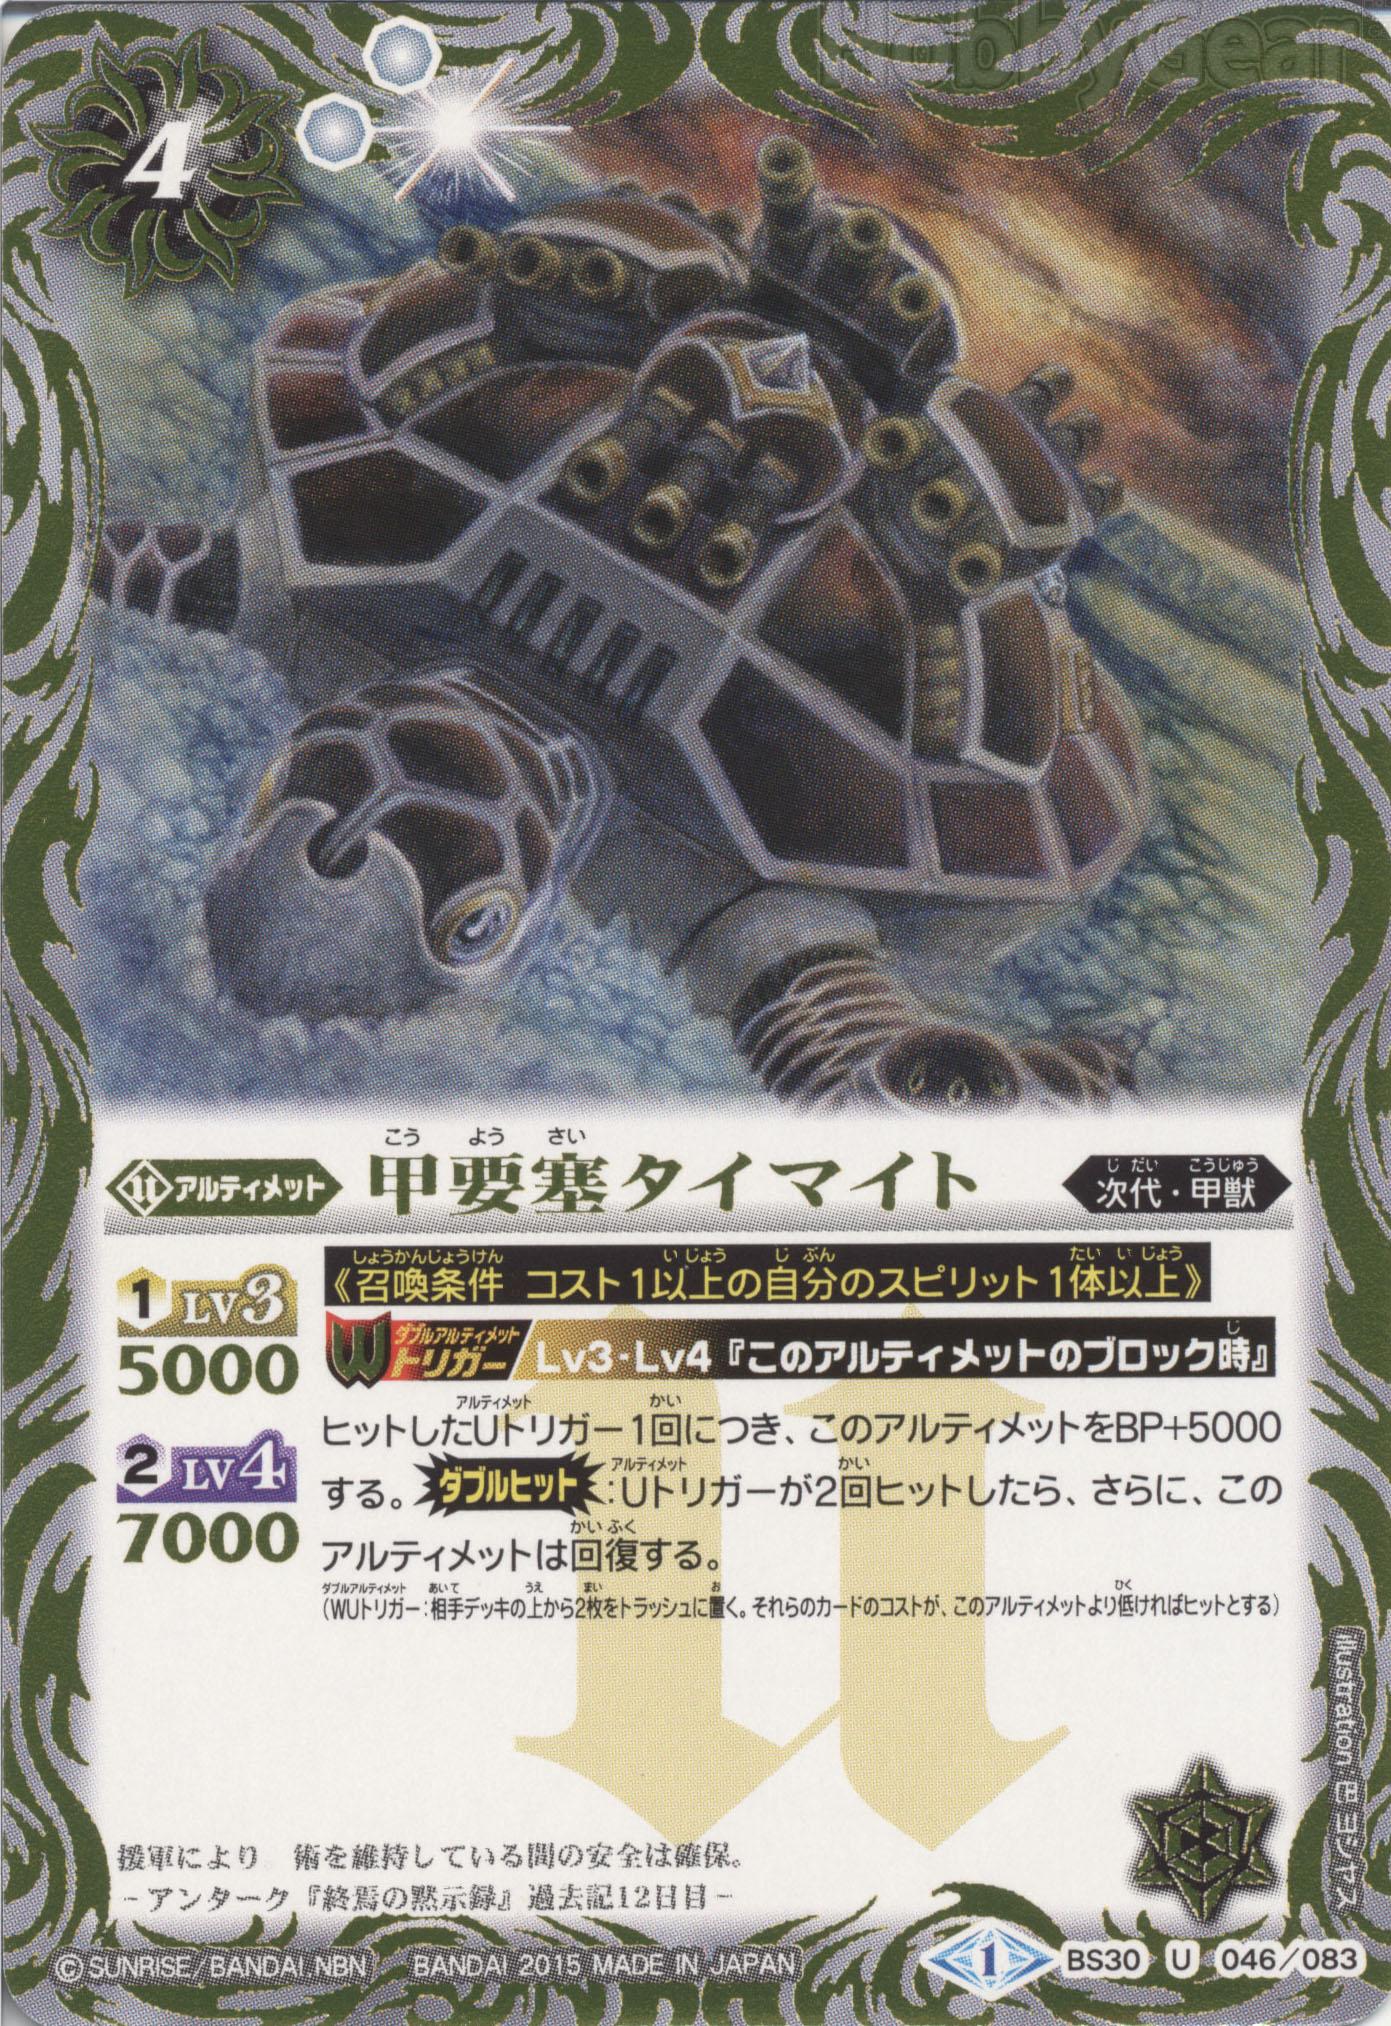 The ArmoredFortress Taimait